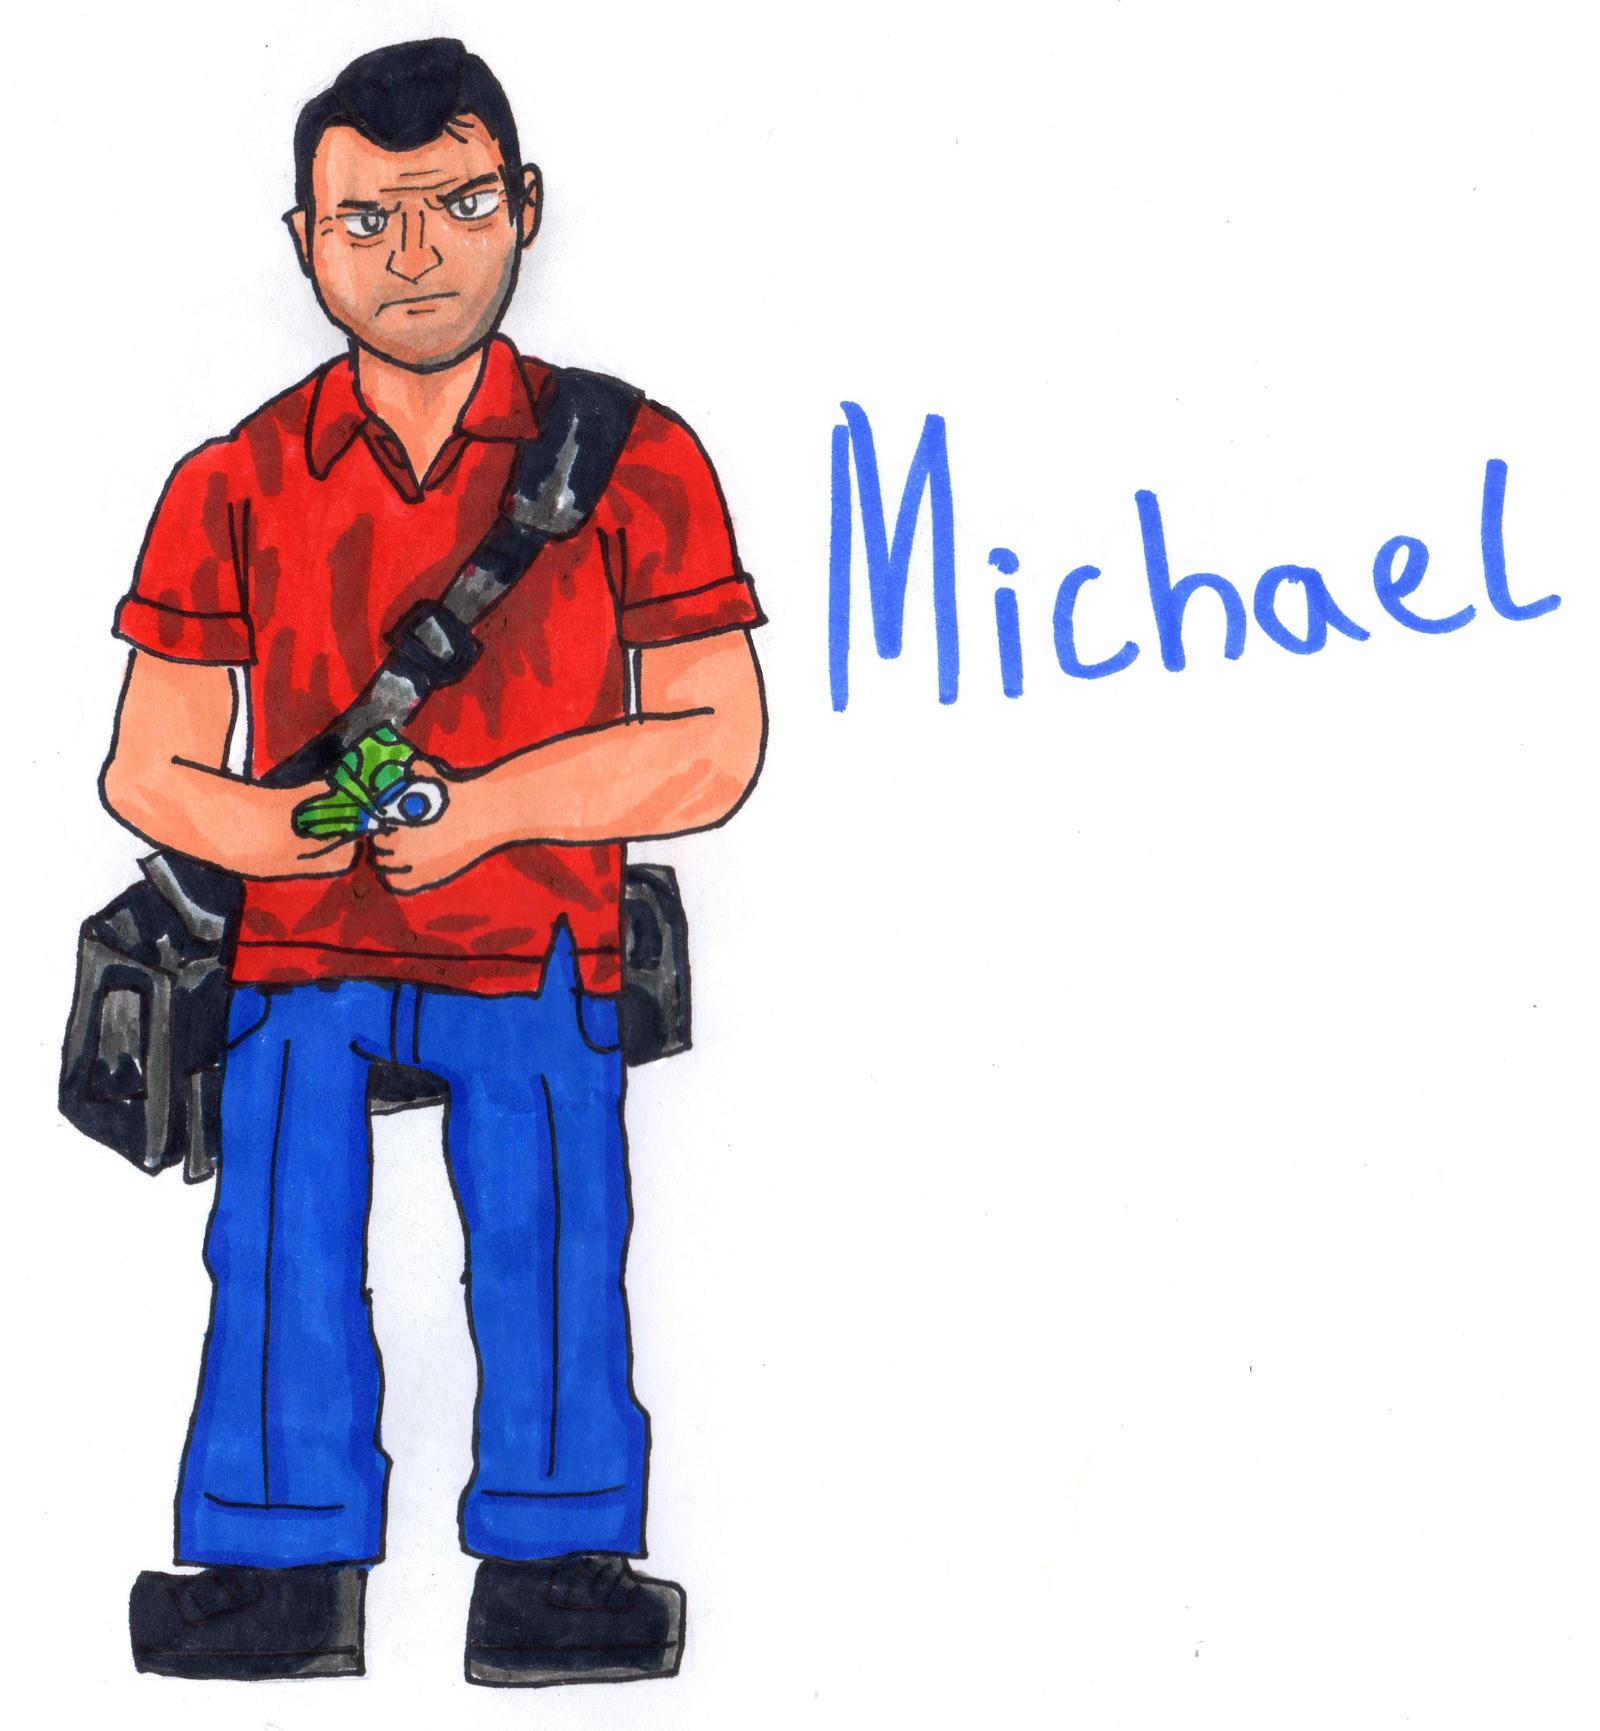 gta 5 michael drawing - photo #27